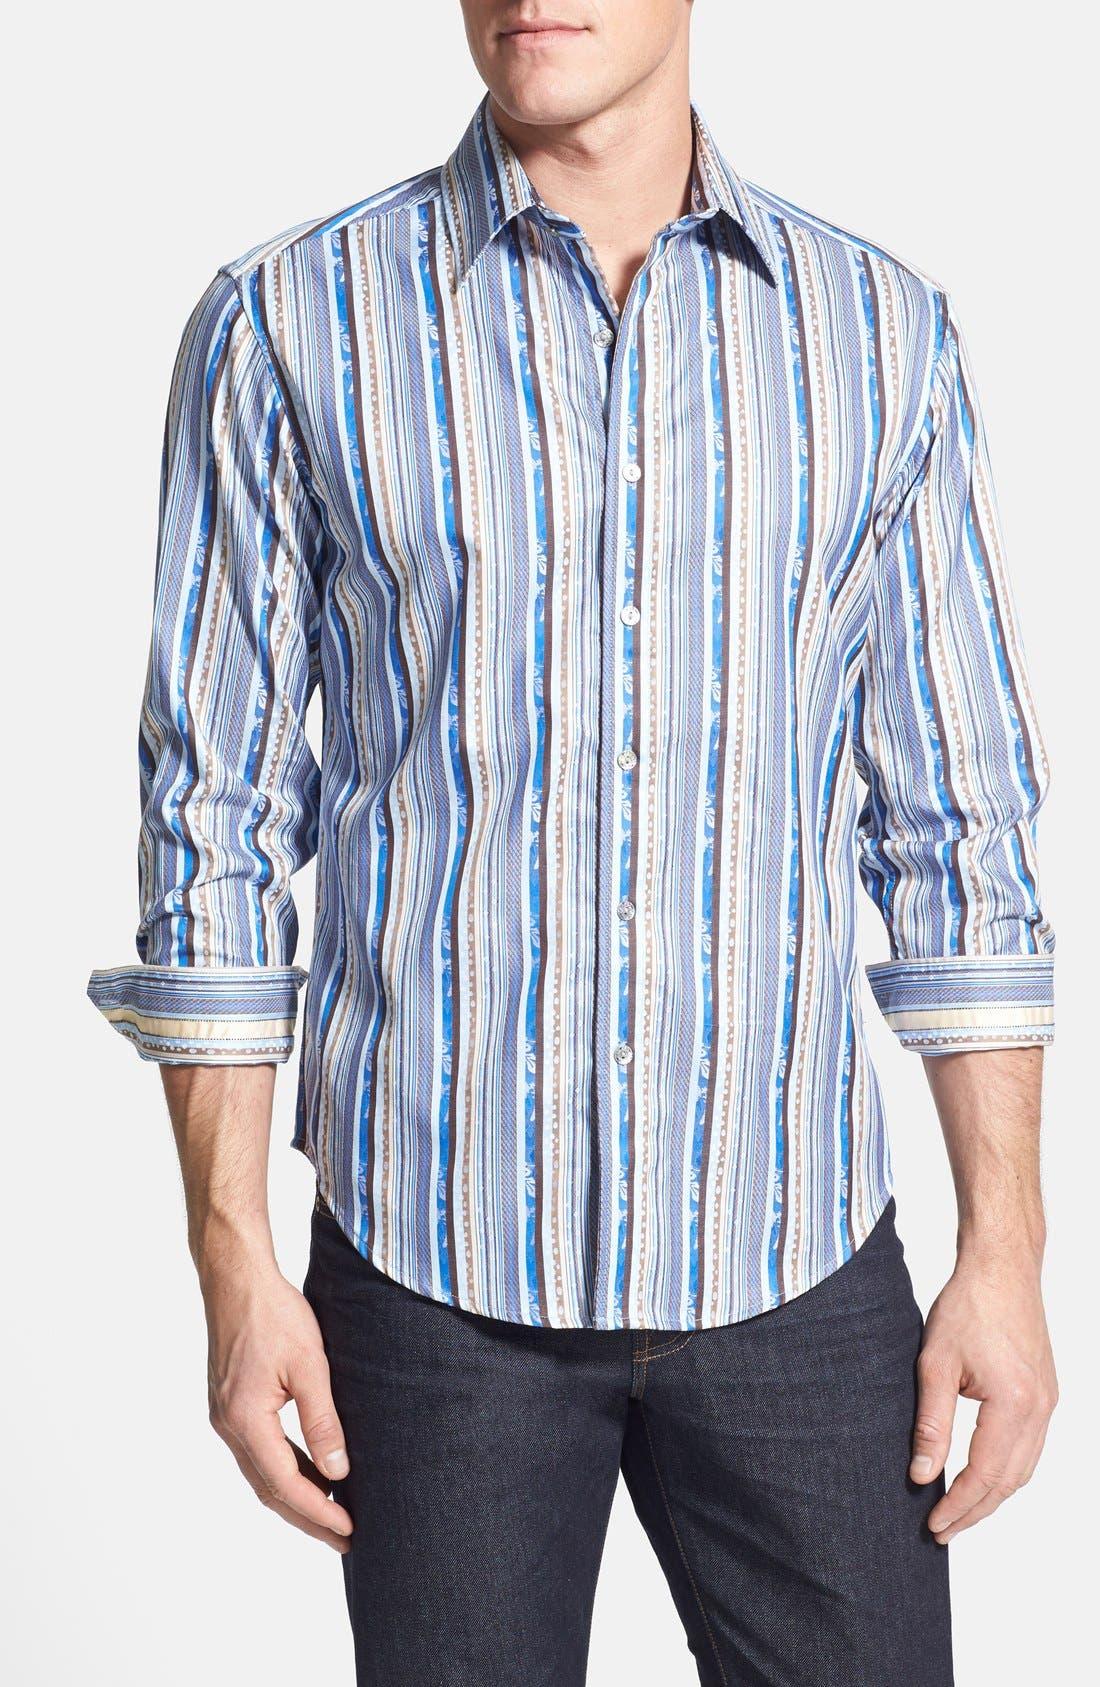 Alternate Image 1 Selected - Robert Graham 'Laurino' Jacquard Sport Shirt